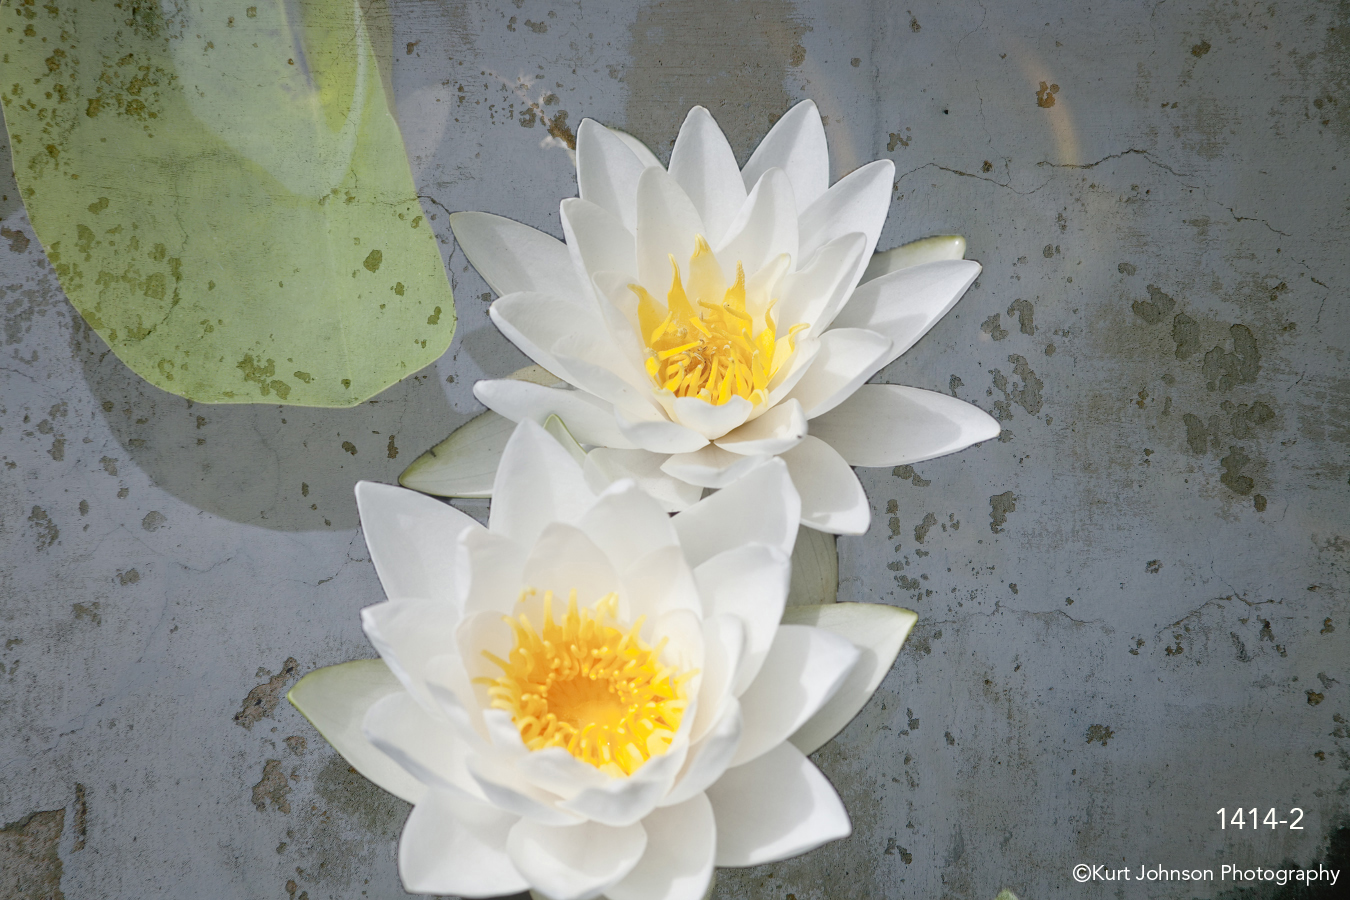 interpretations interpretation filter texture concrete white flower lily leaf flowers water